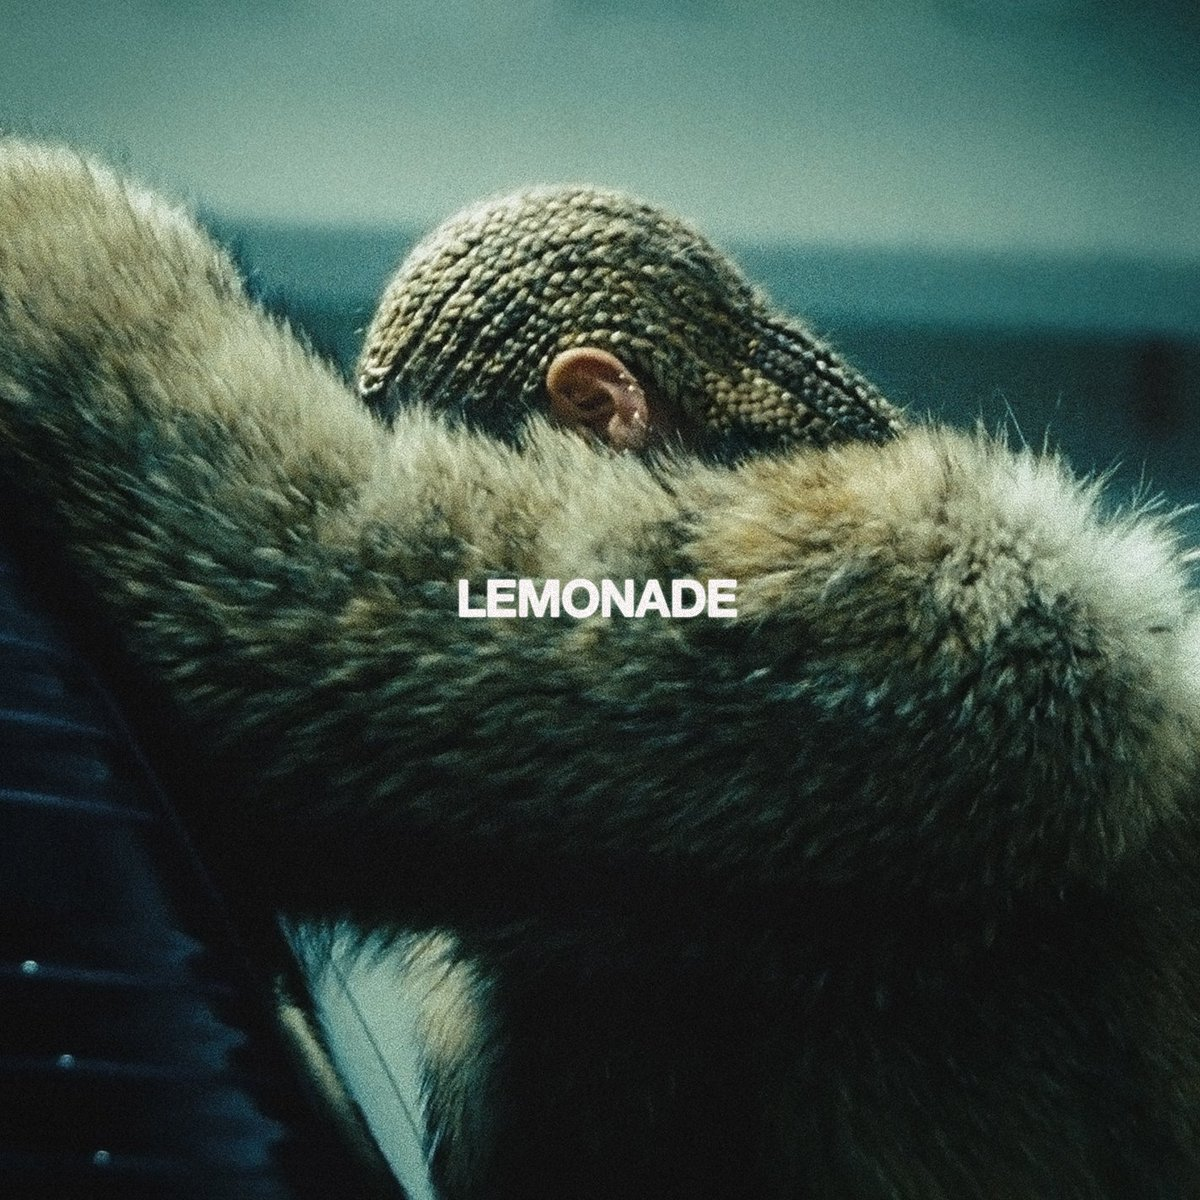 3 Beyoncé albums re-enter the Billboard 200 chart following #Beychella:  • #LEMONADE at No. 91 • #BEYONCÉ at No. 138 • #IAmSashaFierce at No. 160   http:// bit.ly/2Ho4hHU  &nbsp;  <br>http://pic.twitter.com/nZGB8U0a2g